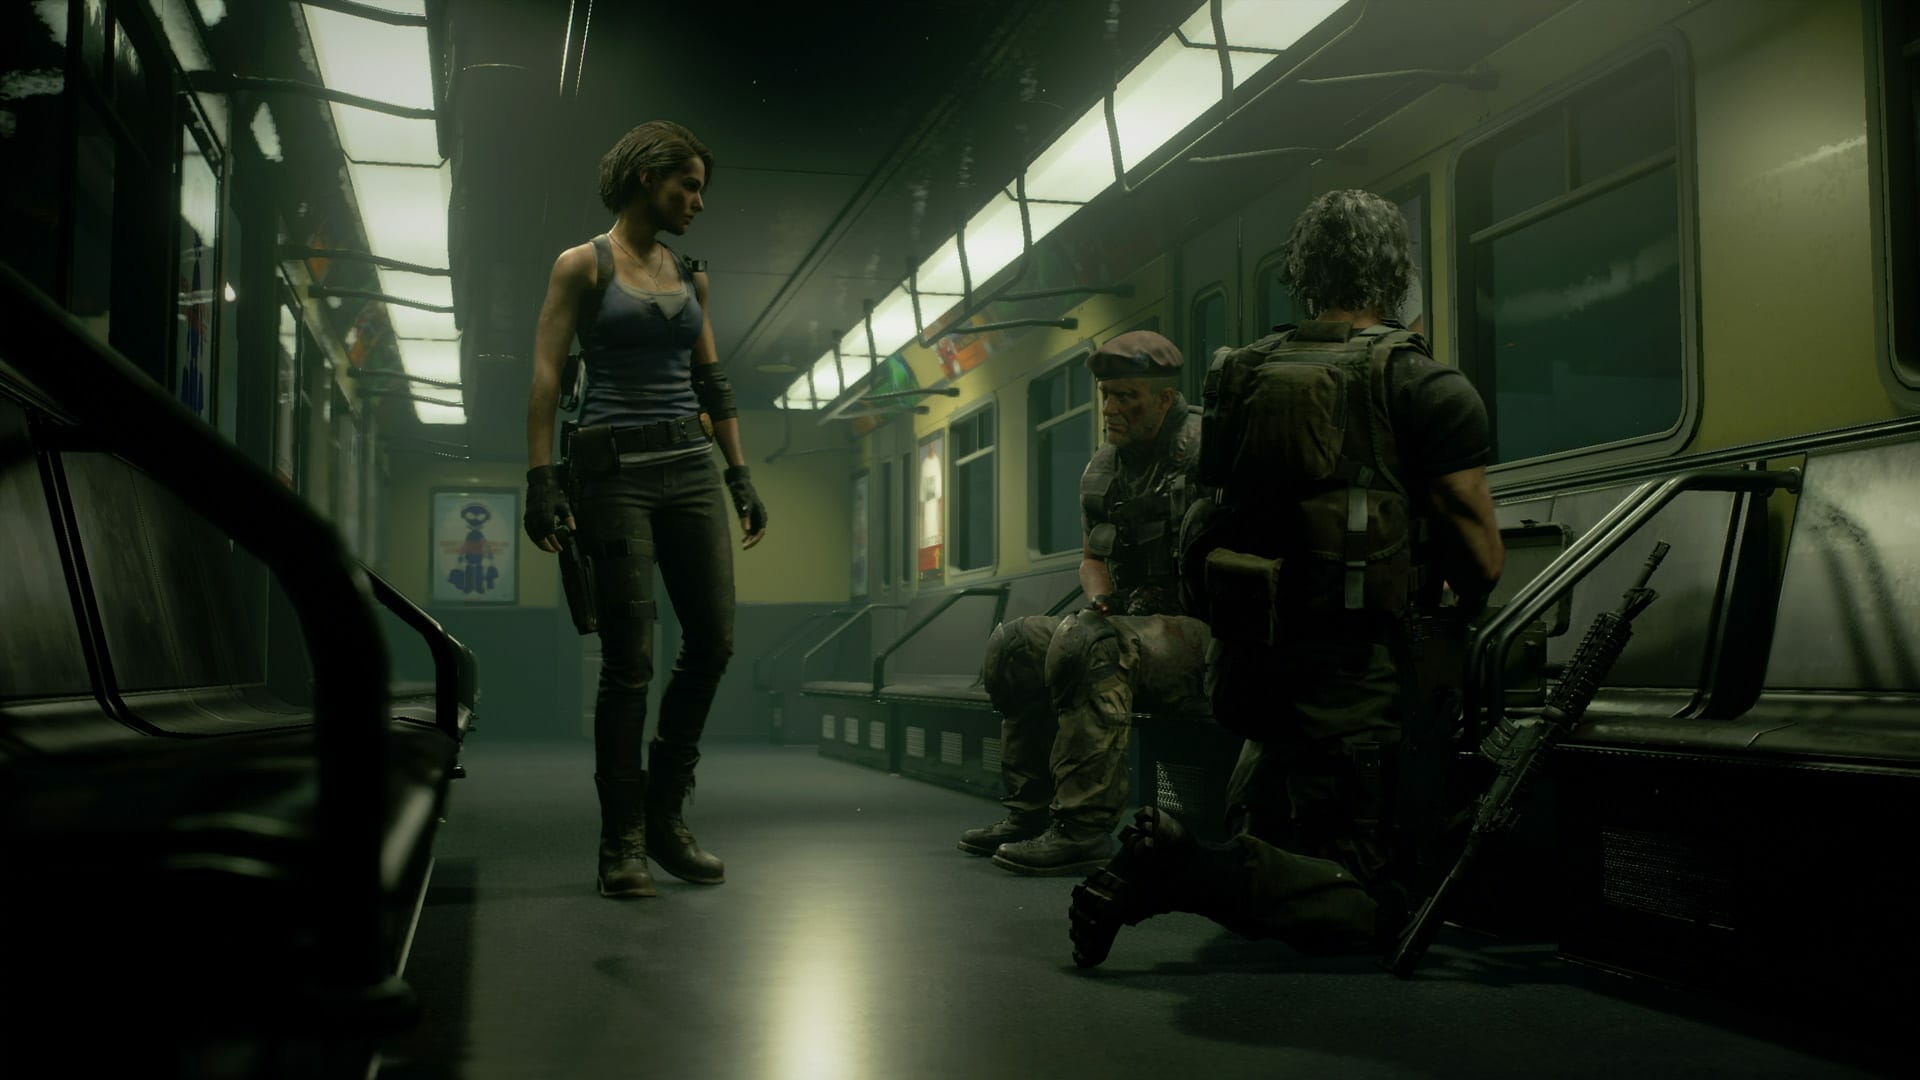 Screnshot 2 - Resident Evil 3 Remake: Release date, Pre-Order and Project Resistance Details Revealed